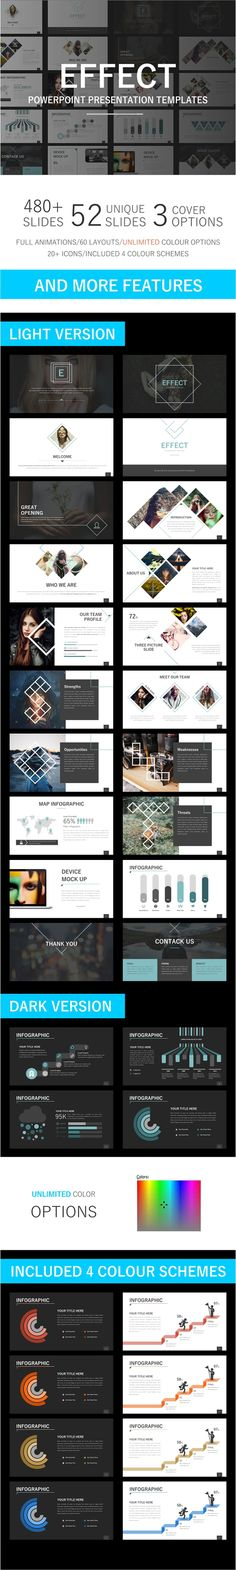 Hotel presentation pinterest business powerpoint templates effect powerpoint template toneelgroepblik Image collections